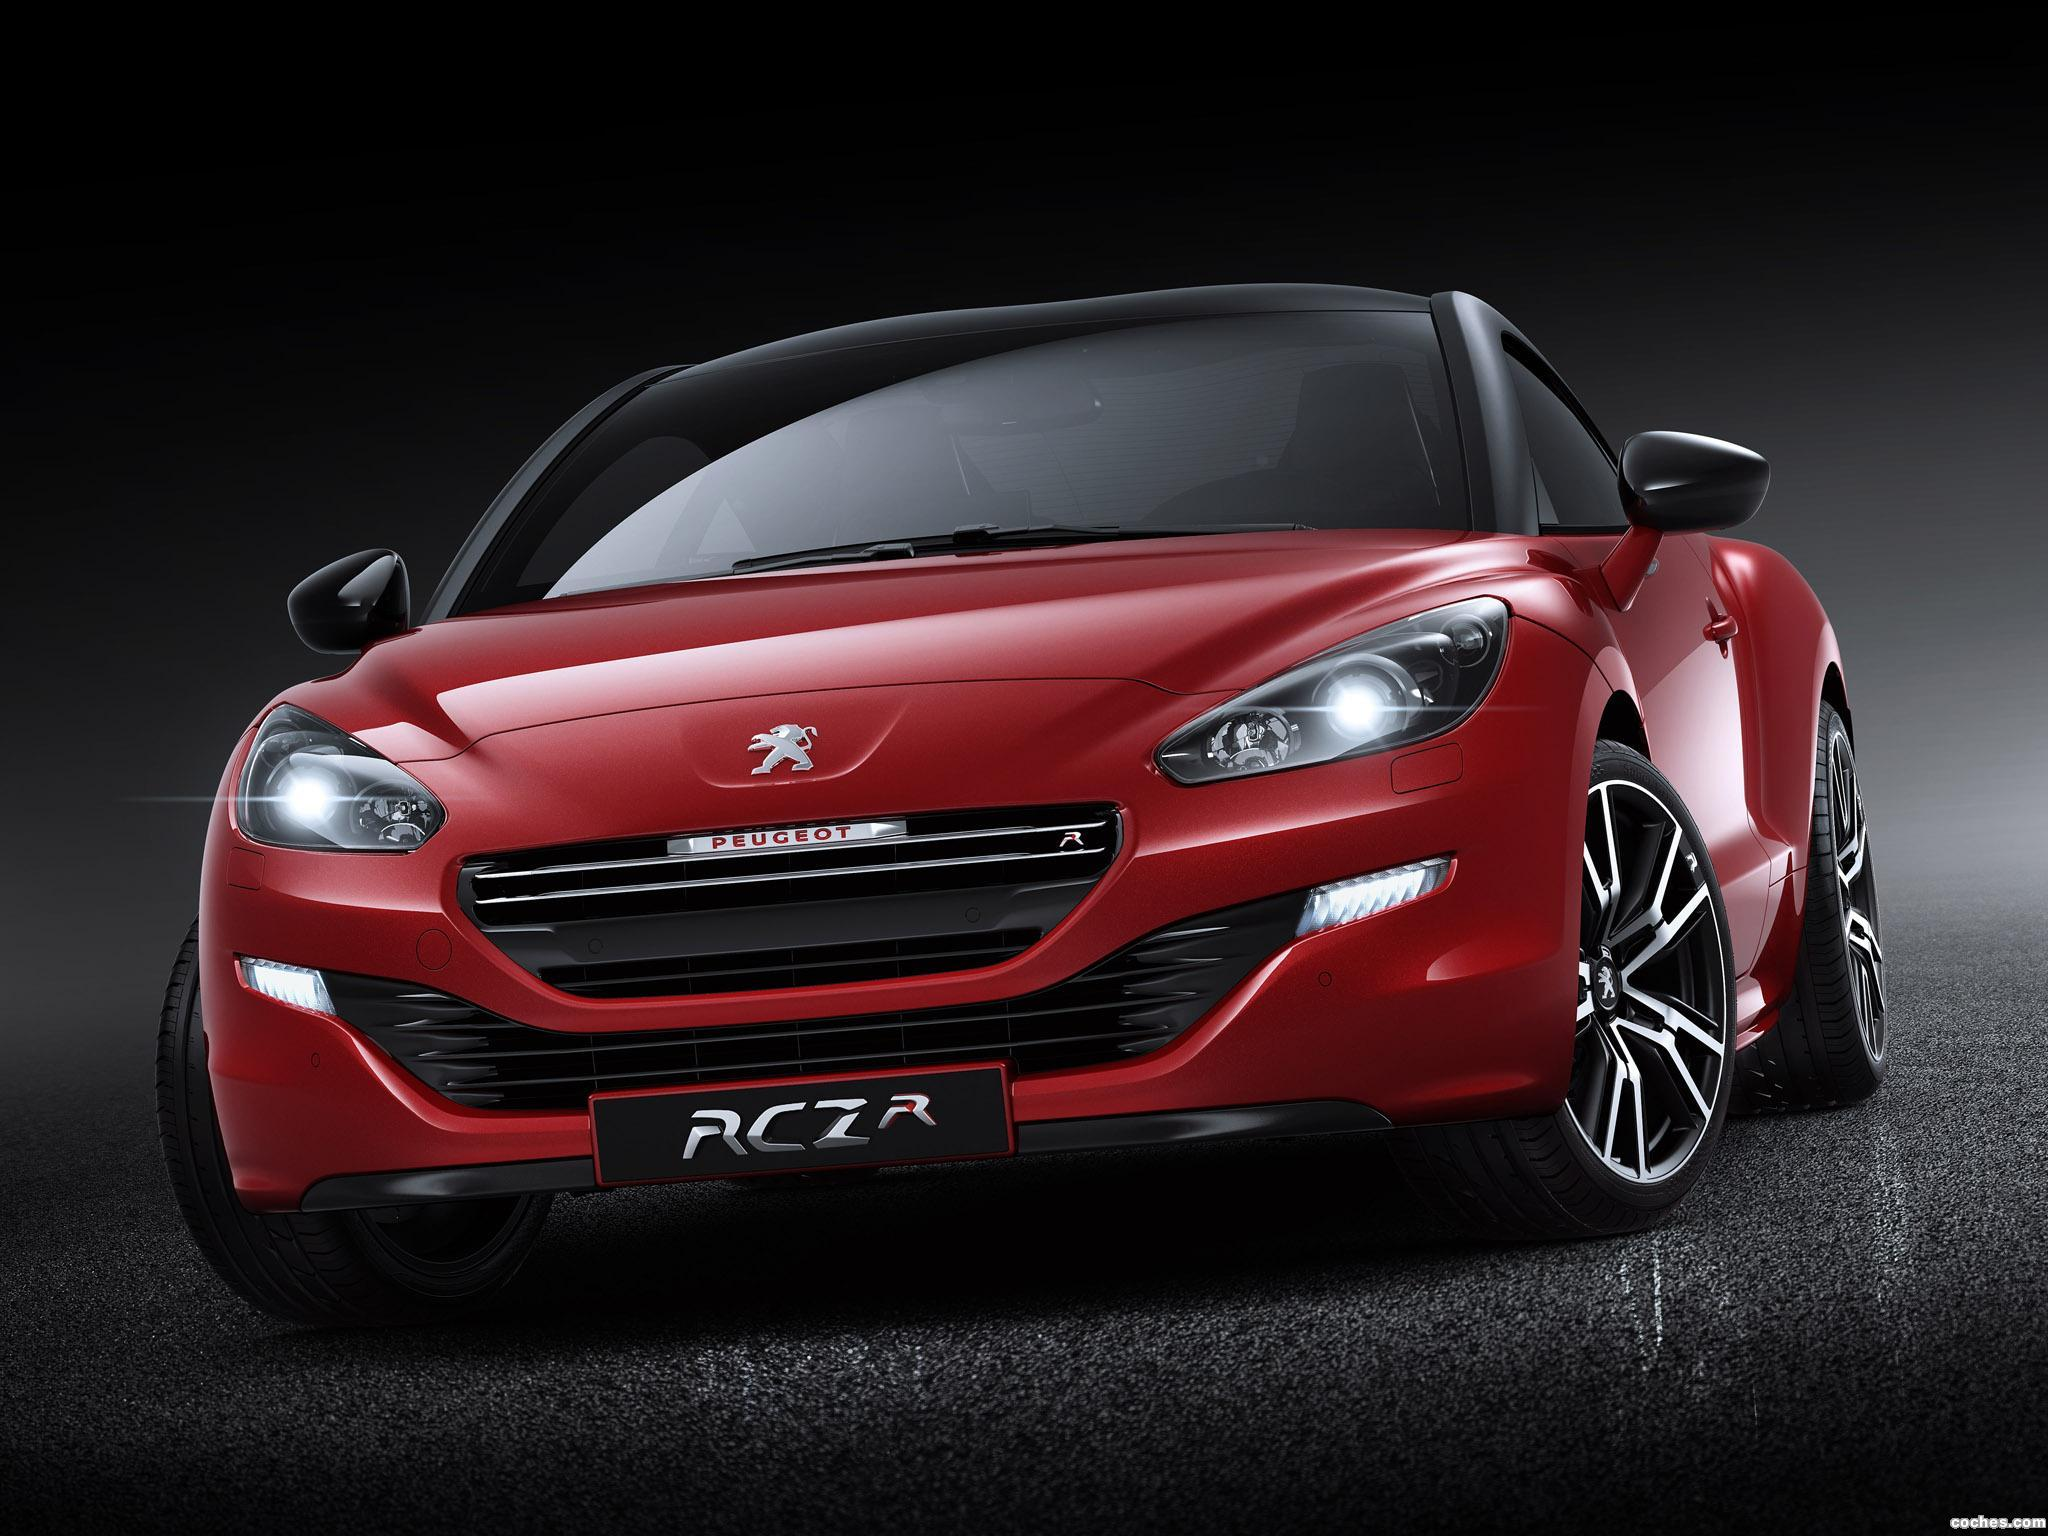 Foto 0 de Peugeot RCZ R 2013